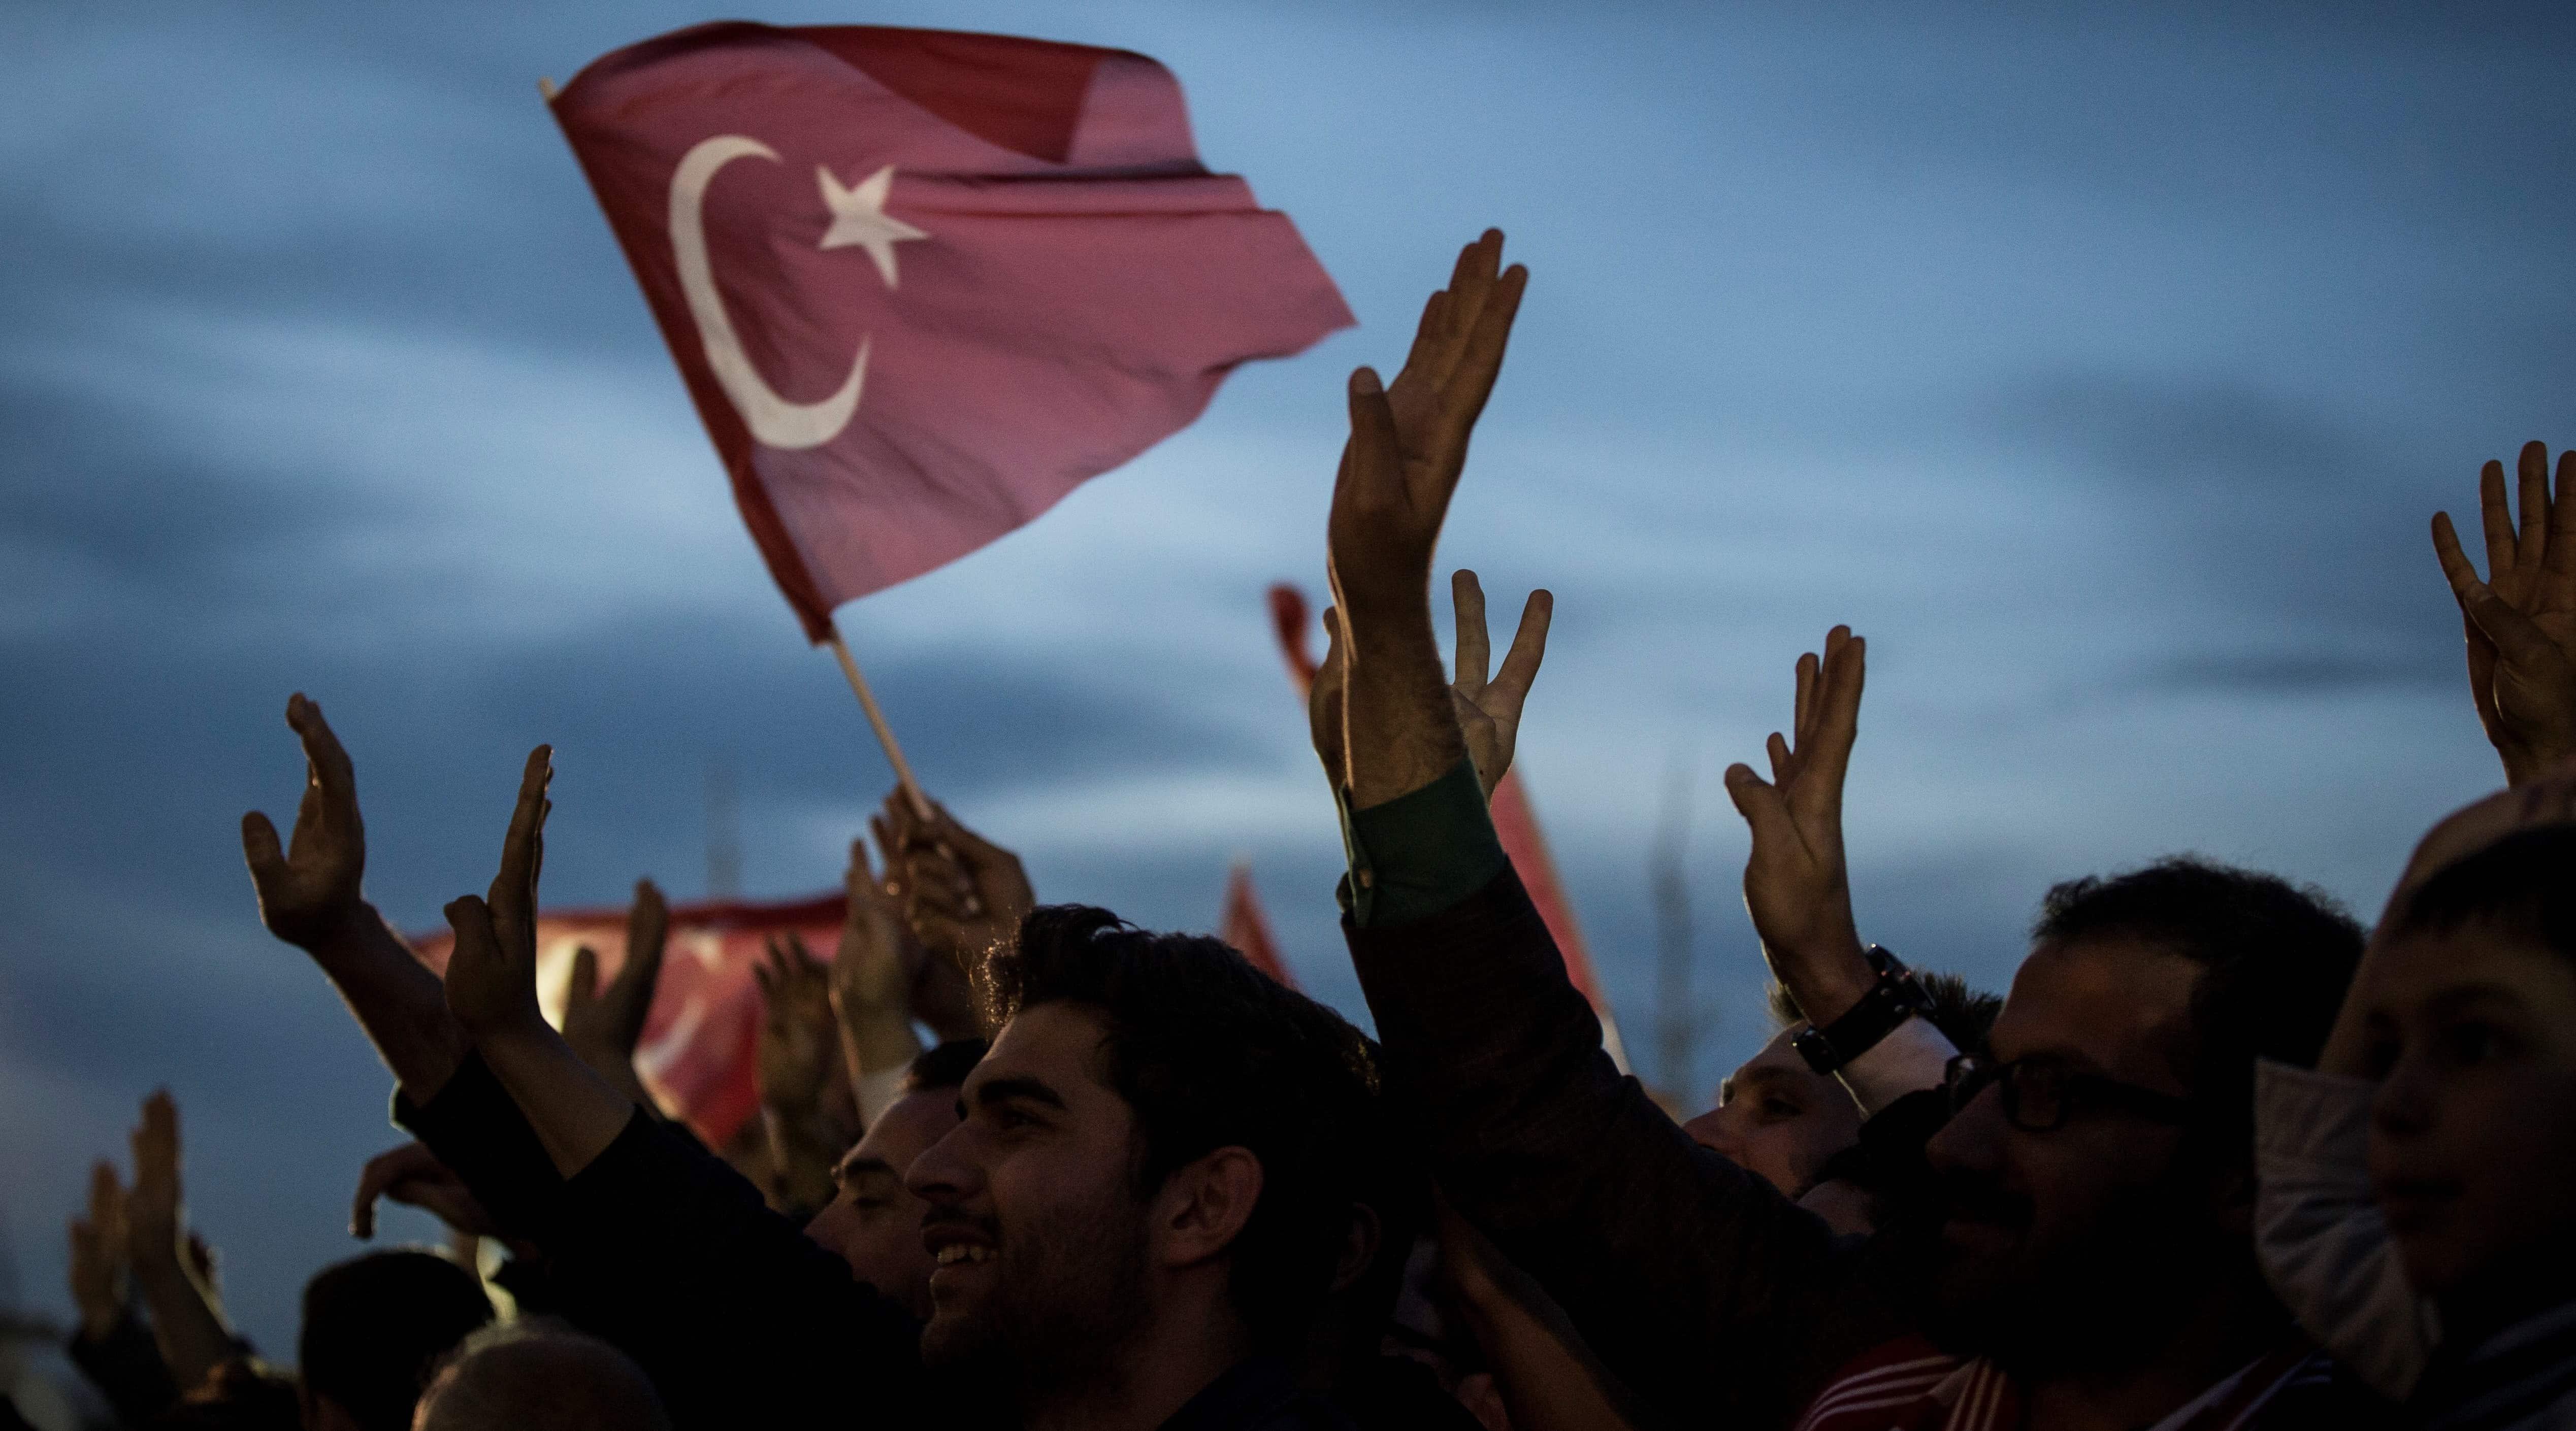 Photo: Getty Images/Anadolu Agency